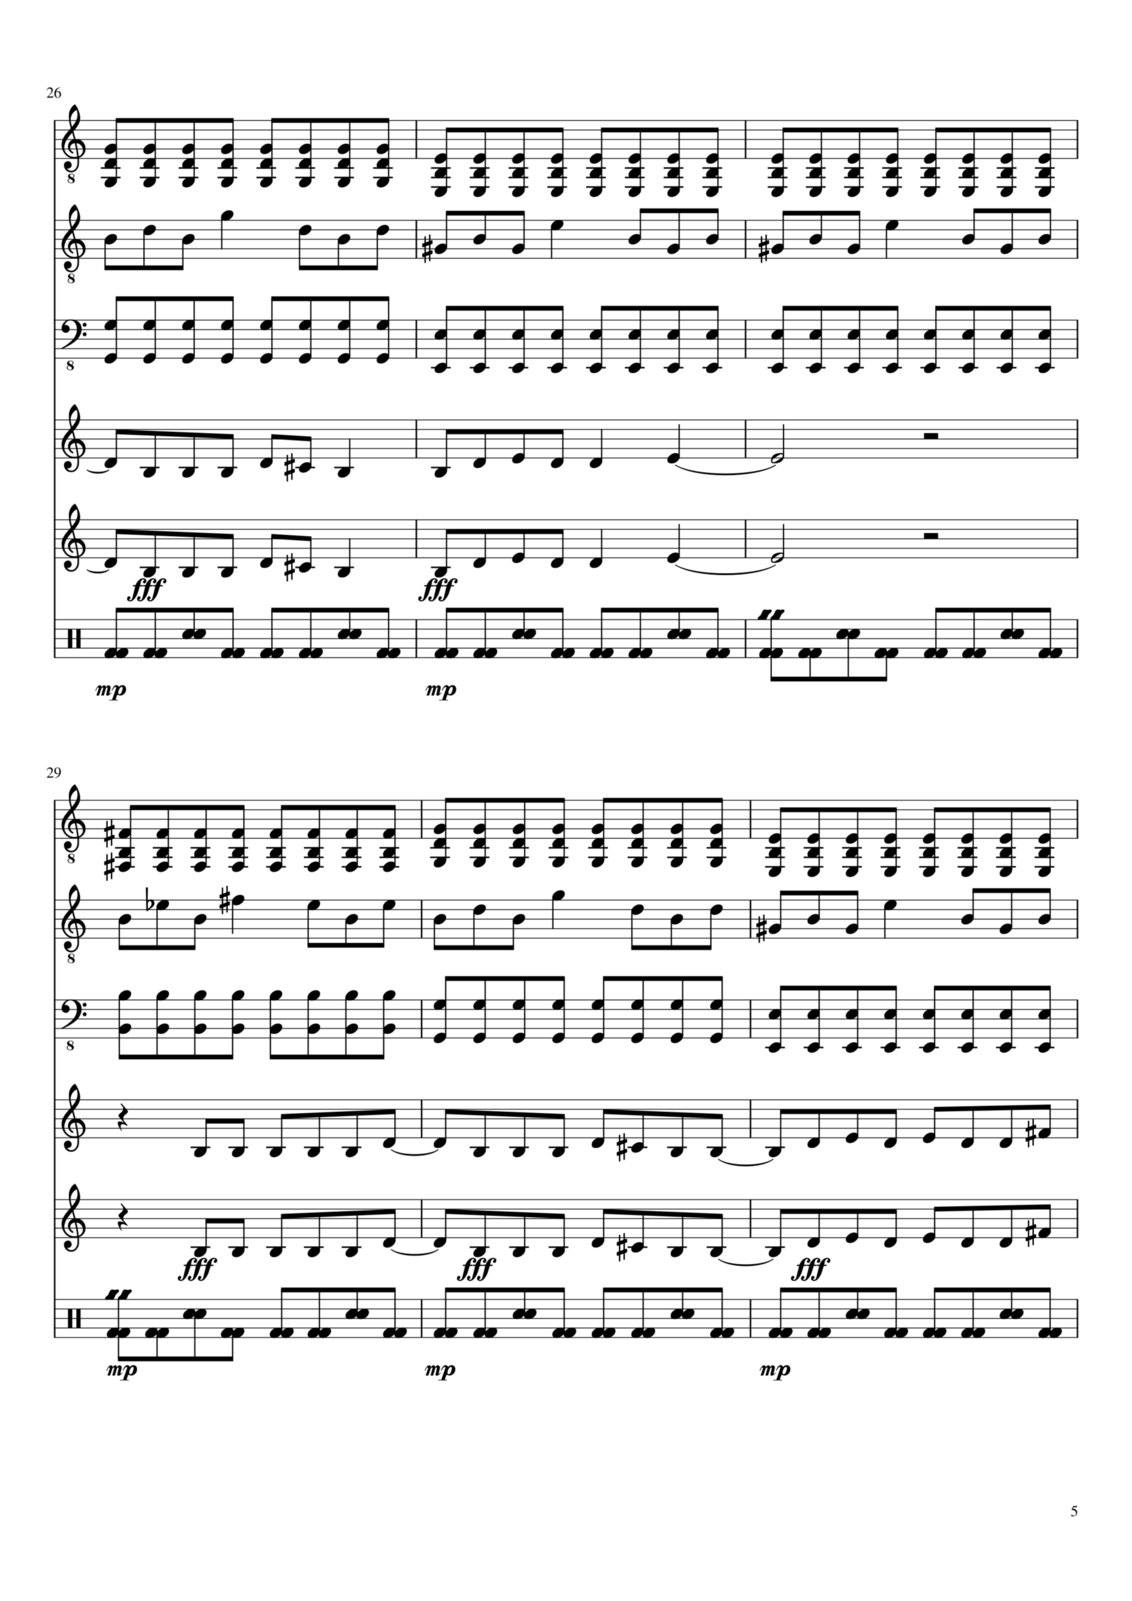 Ot Bolshogo Uma slide, Image 5